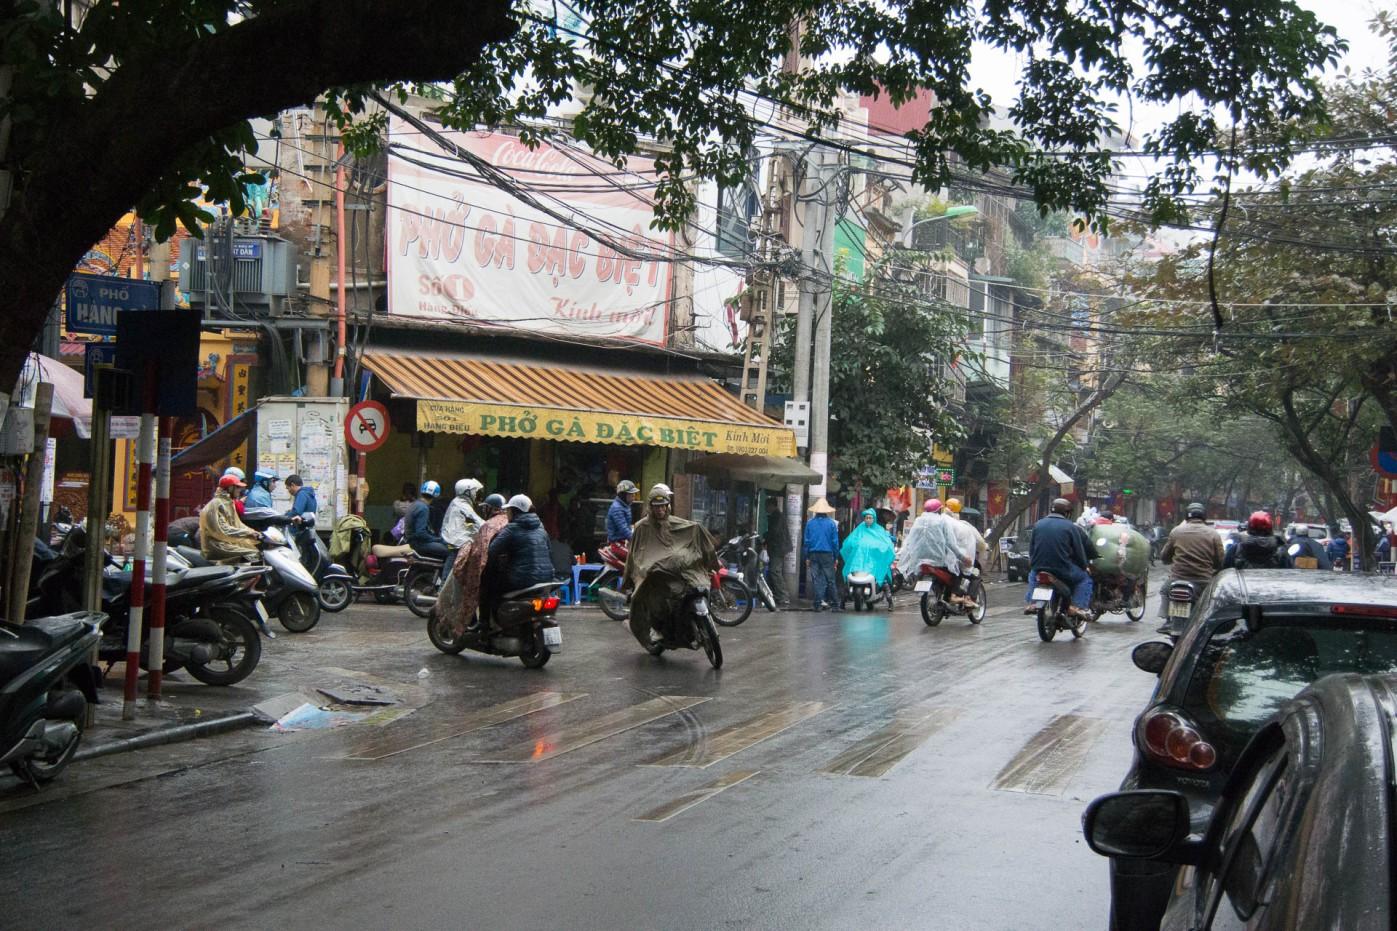 Hanoi - Motor bikes Rule